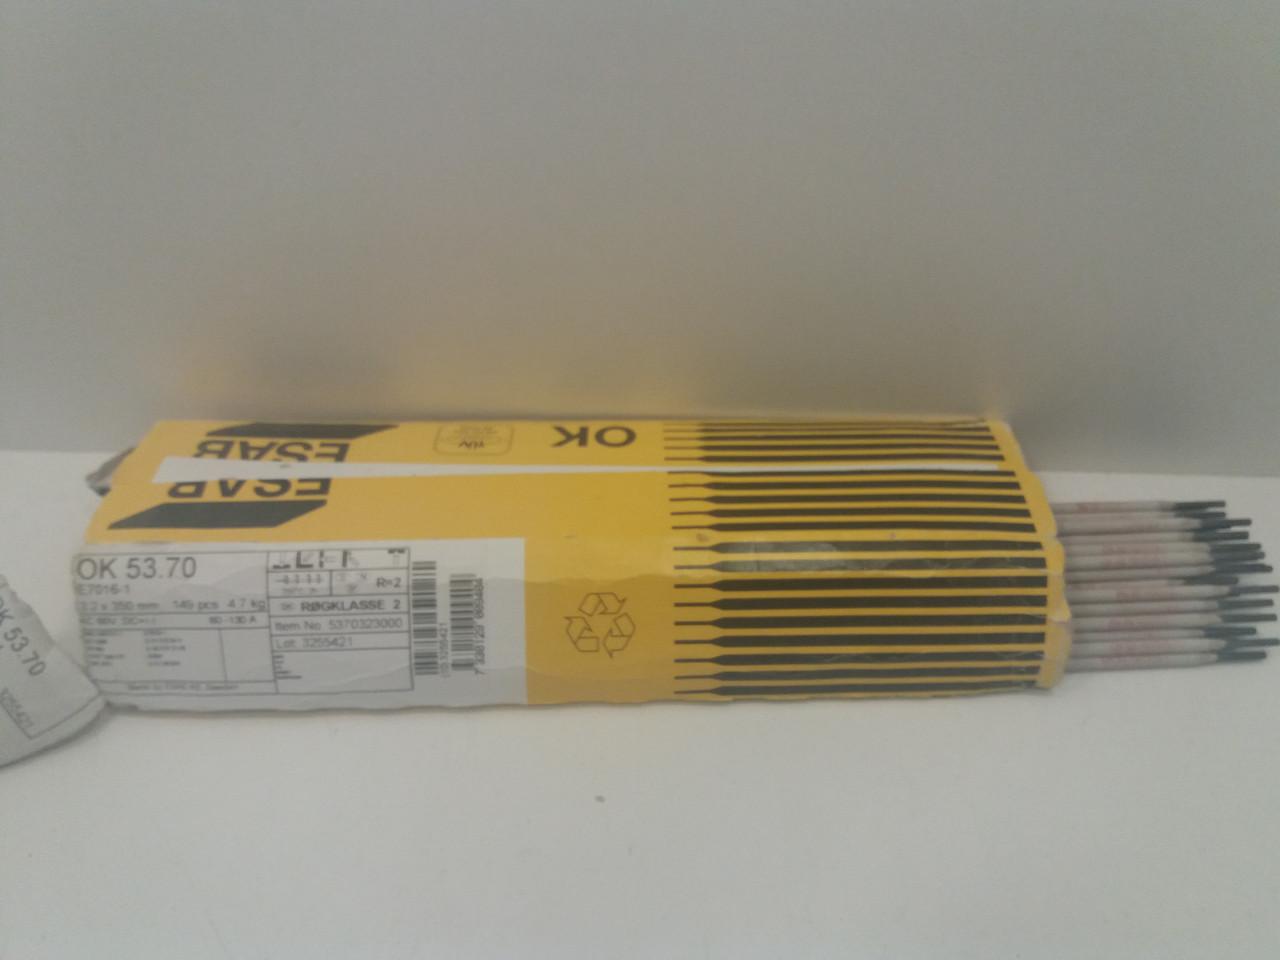 ESAB OK 53.70 3.2x350mm (Швеция) аналог ЦУ-5